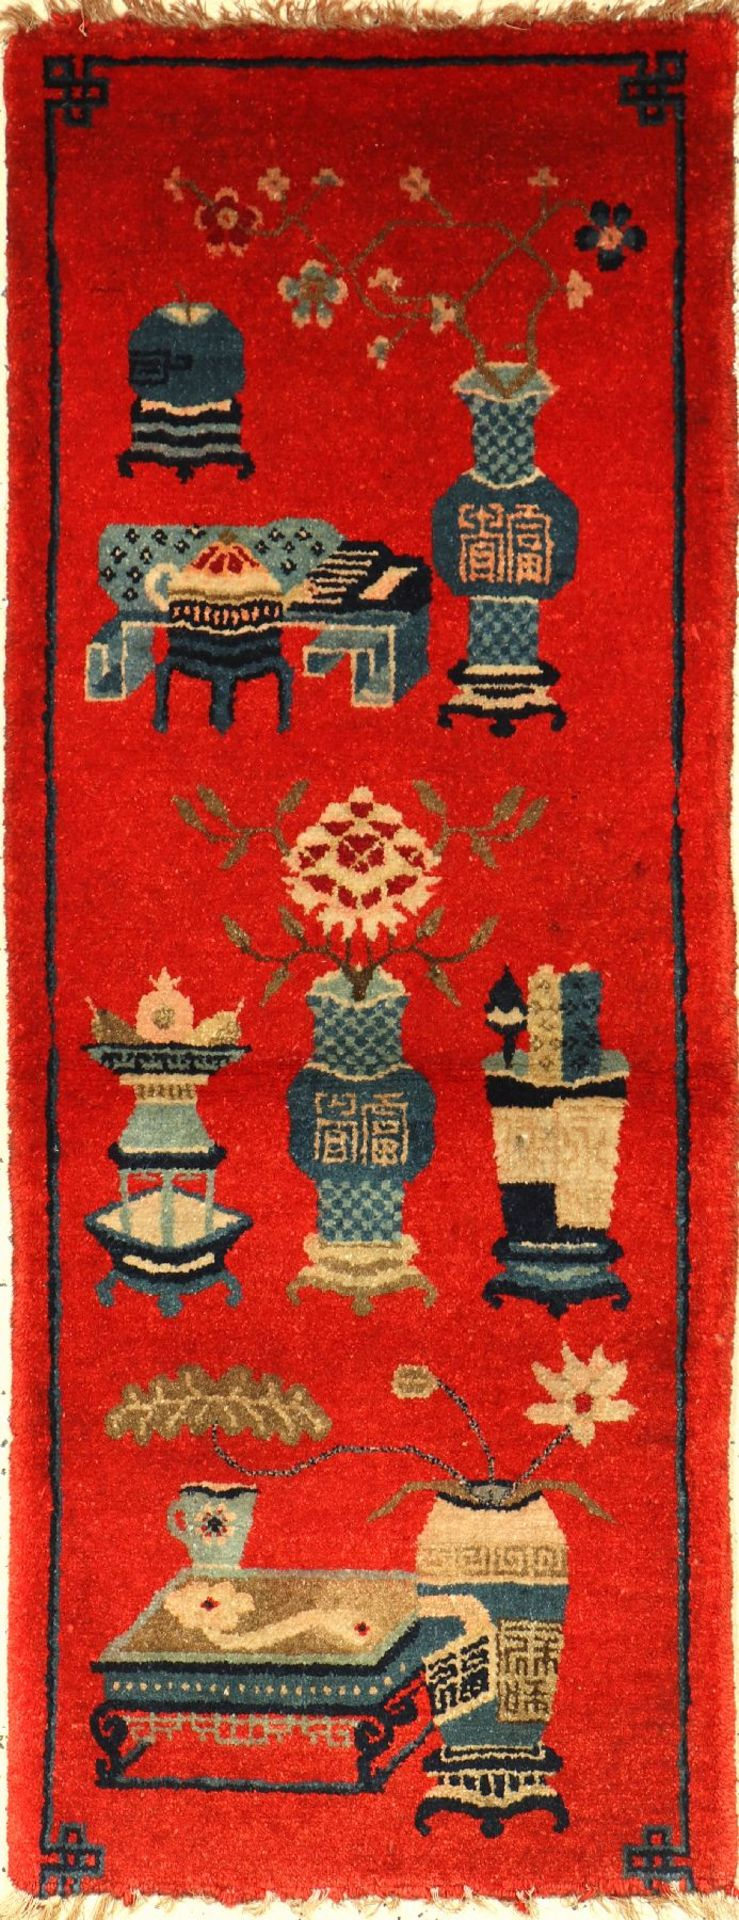 Pao Tao antik, China, um 1900, Wolle auf Baumwolle, ca. 131 x 52 cm, EHZ: 3, unten verkürztPao Tao